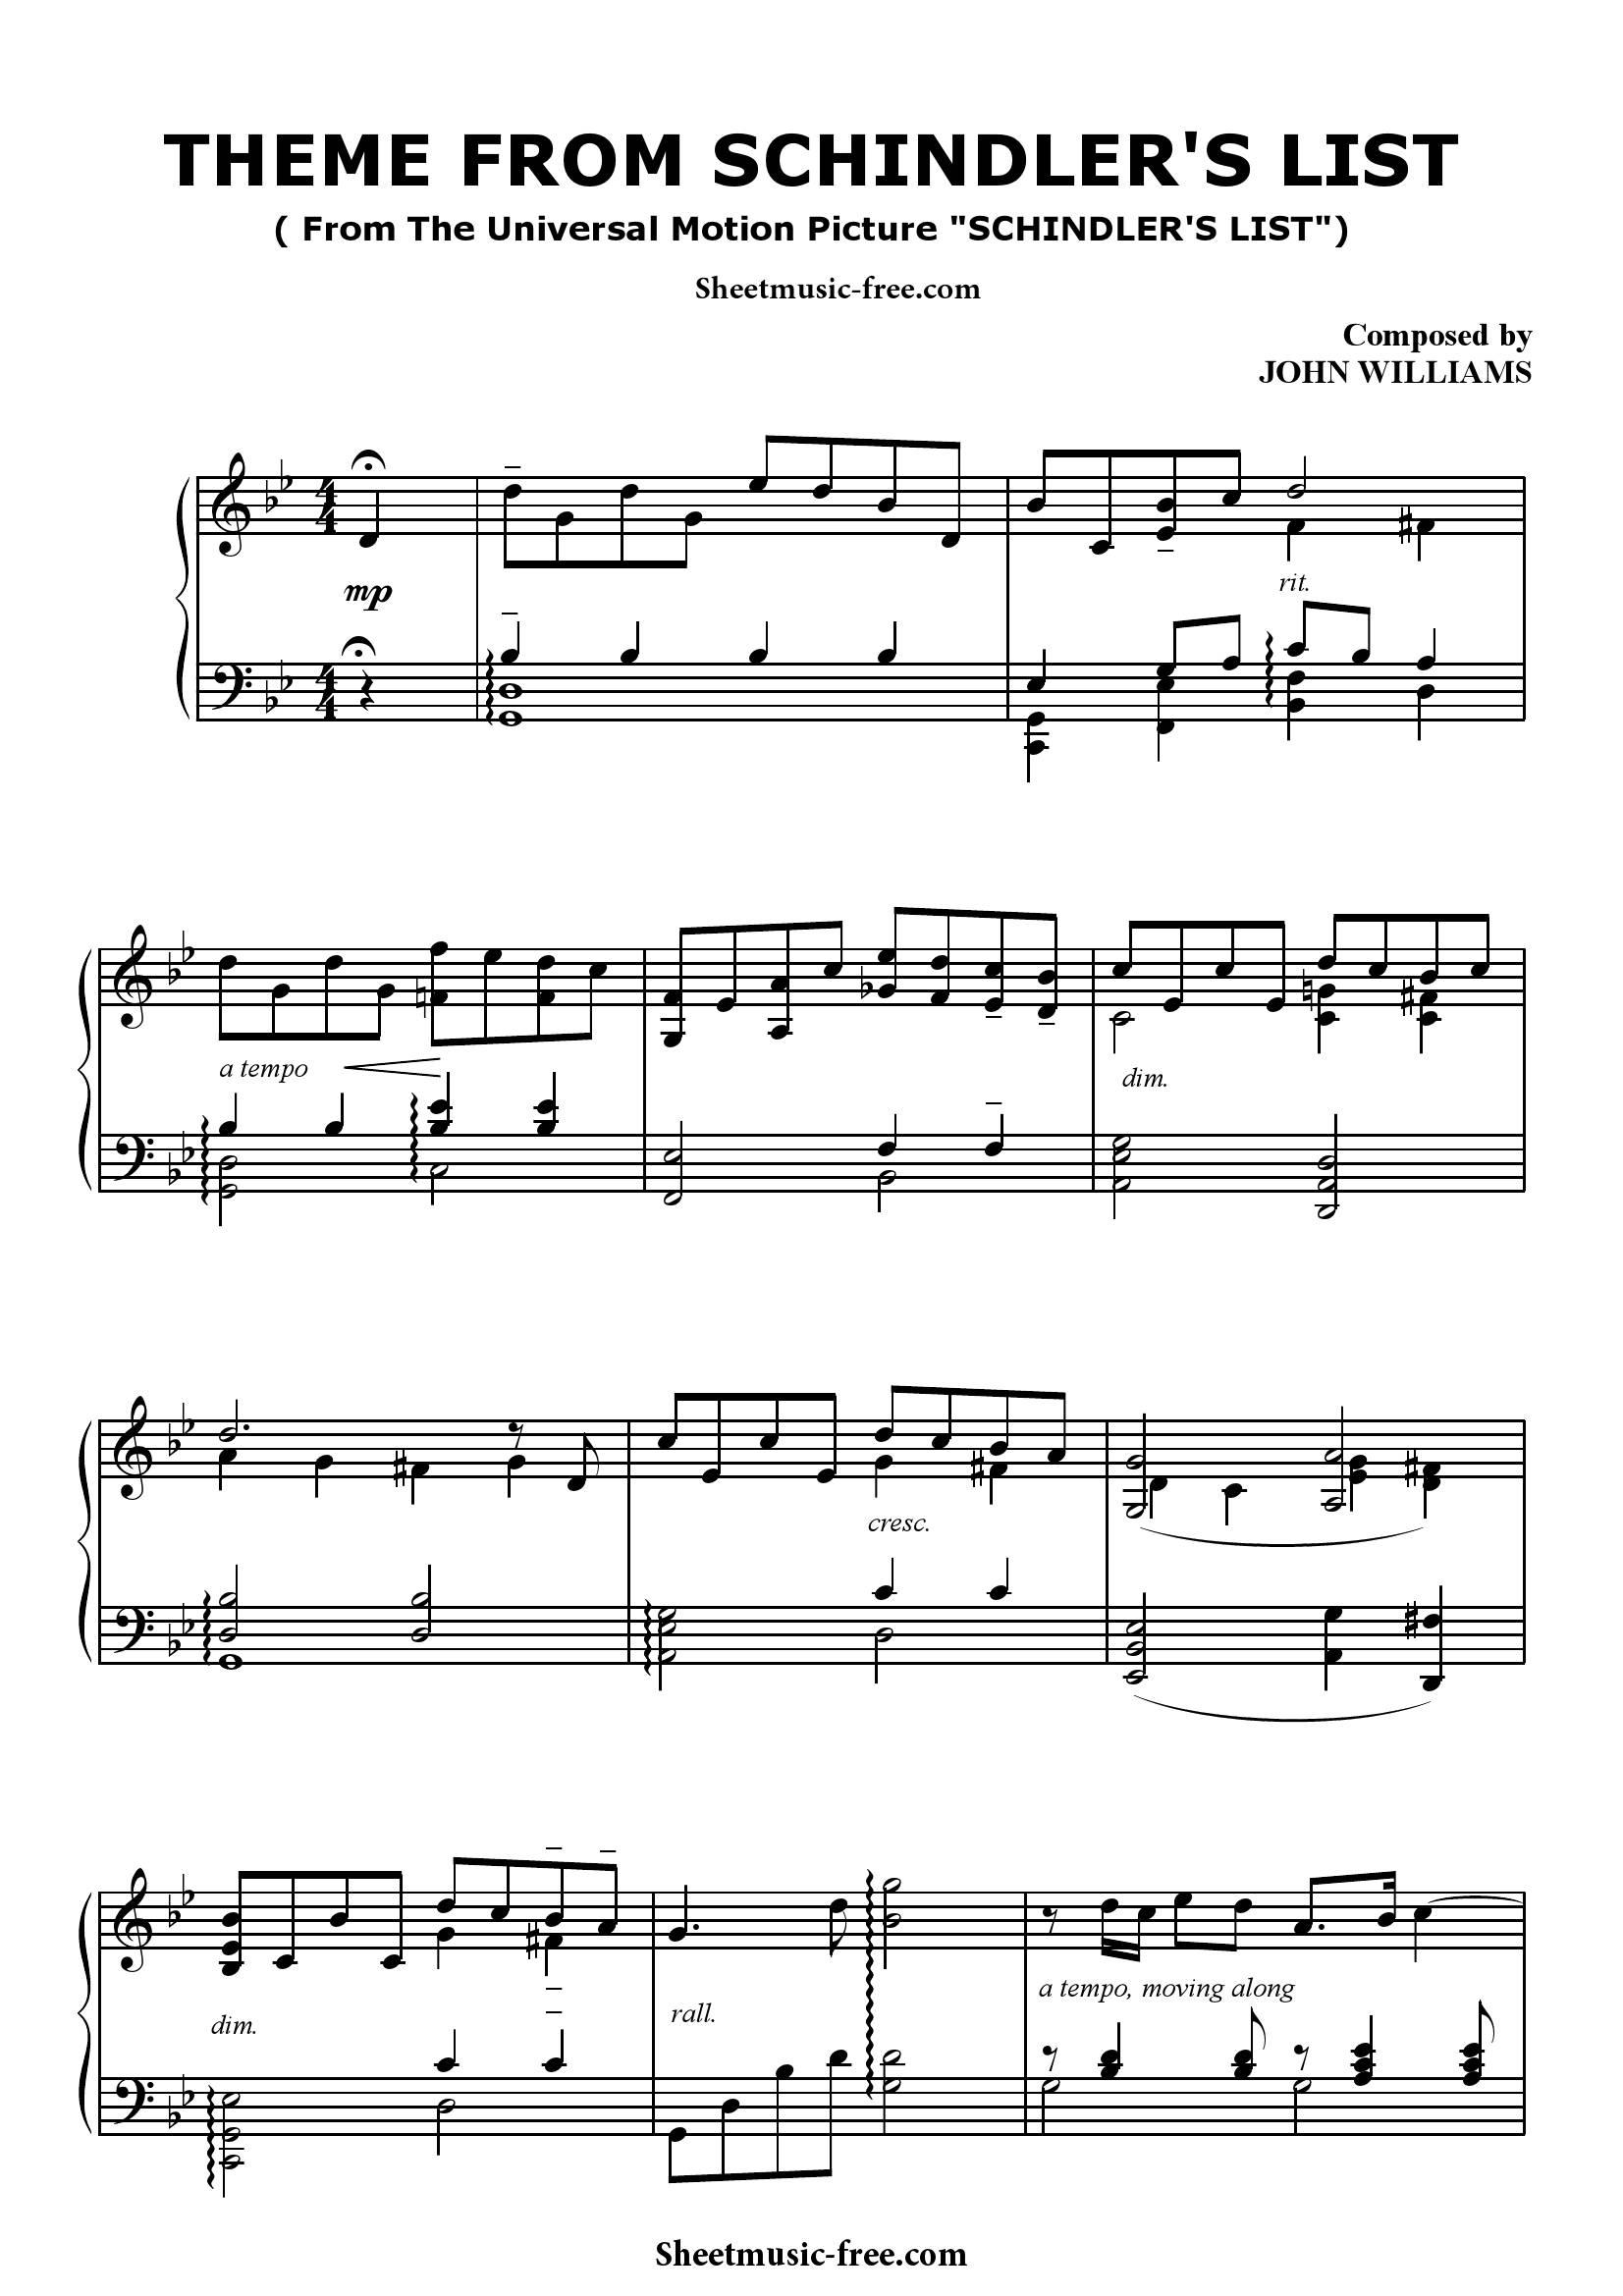 John williams Schindlers List1 - نت آهنگ Schindlers List از John williams